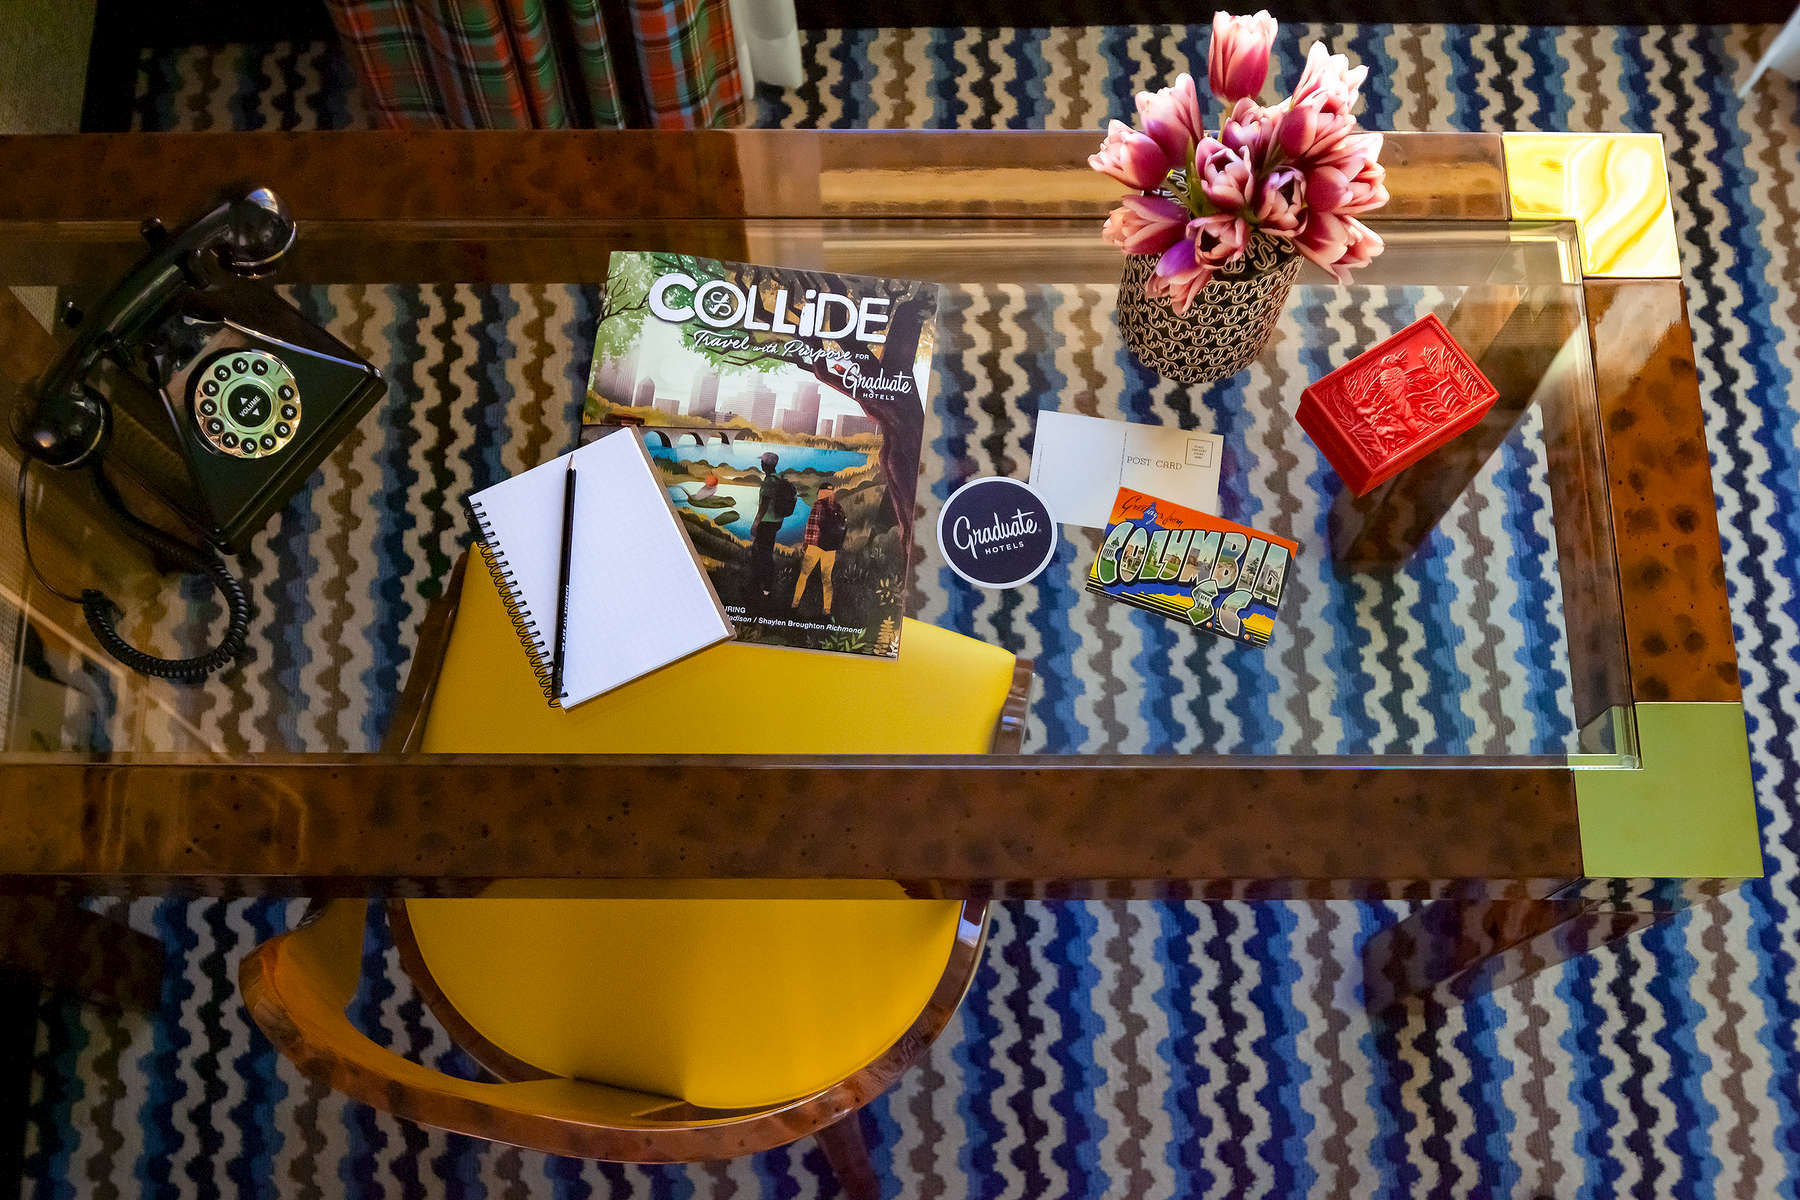 Graduate ColumbiaGraduate Hotels